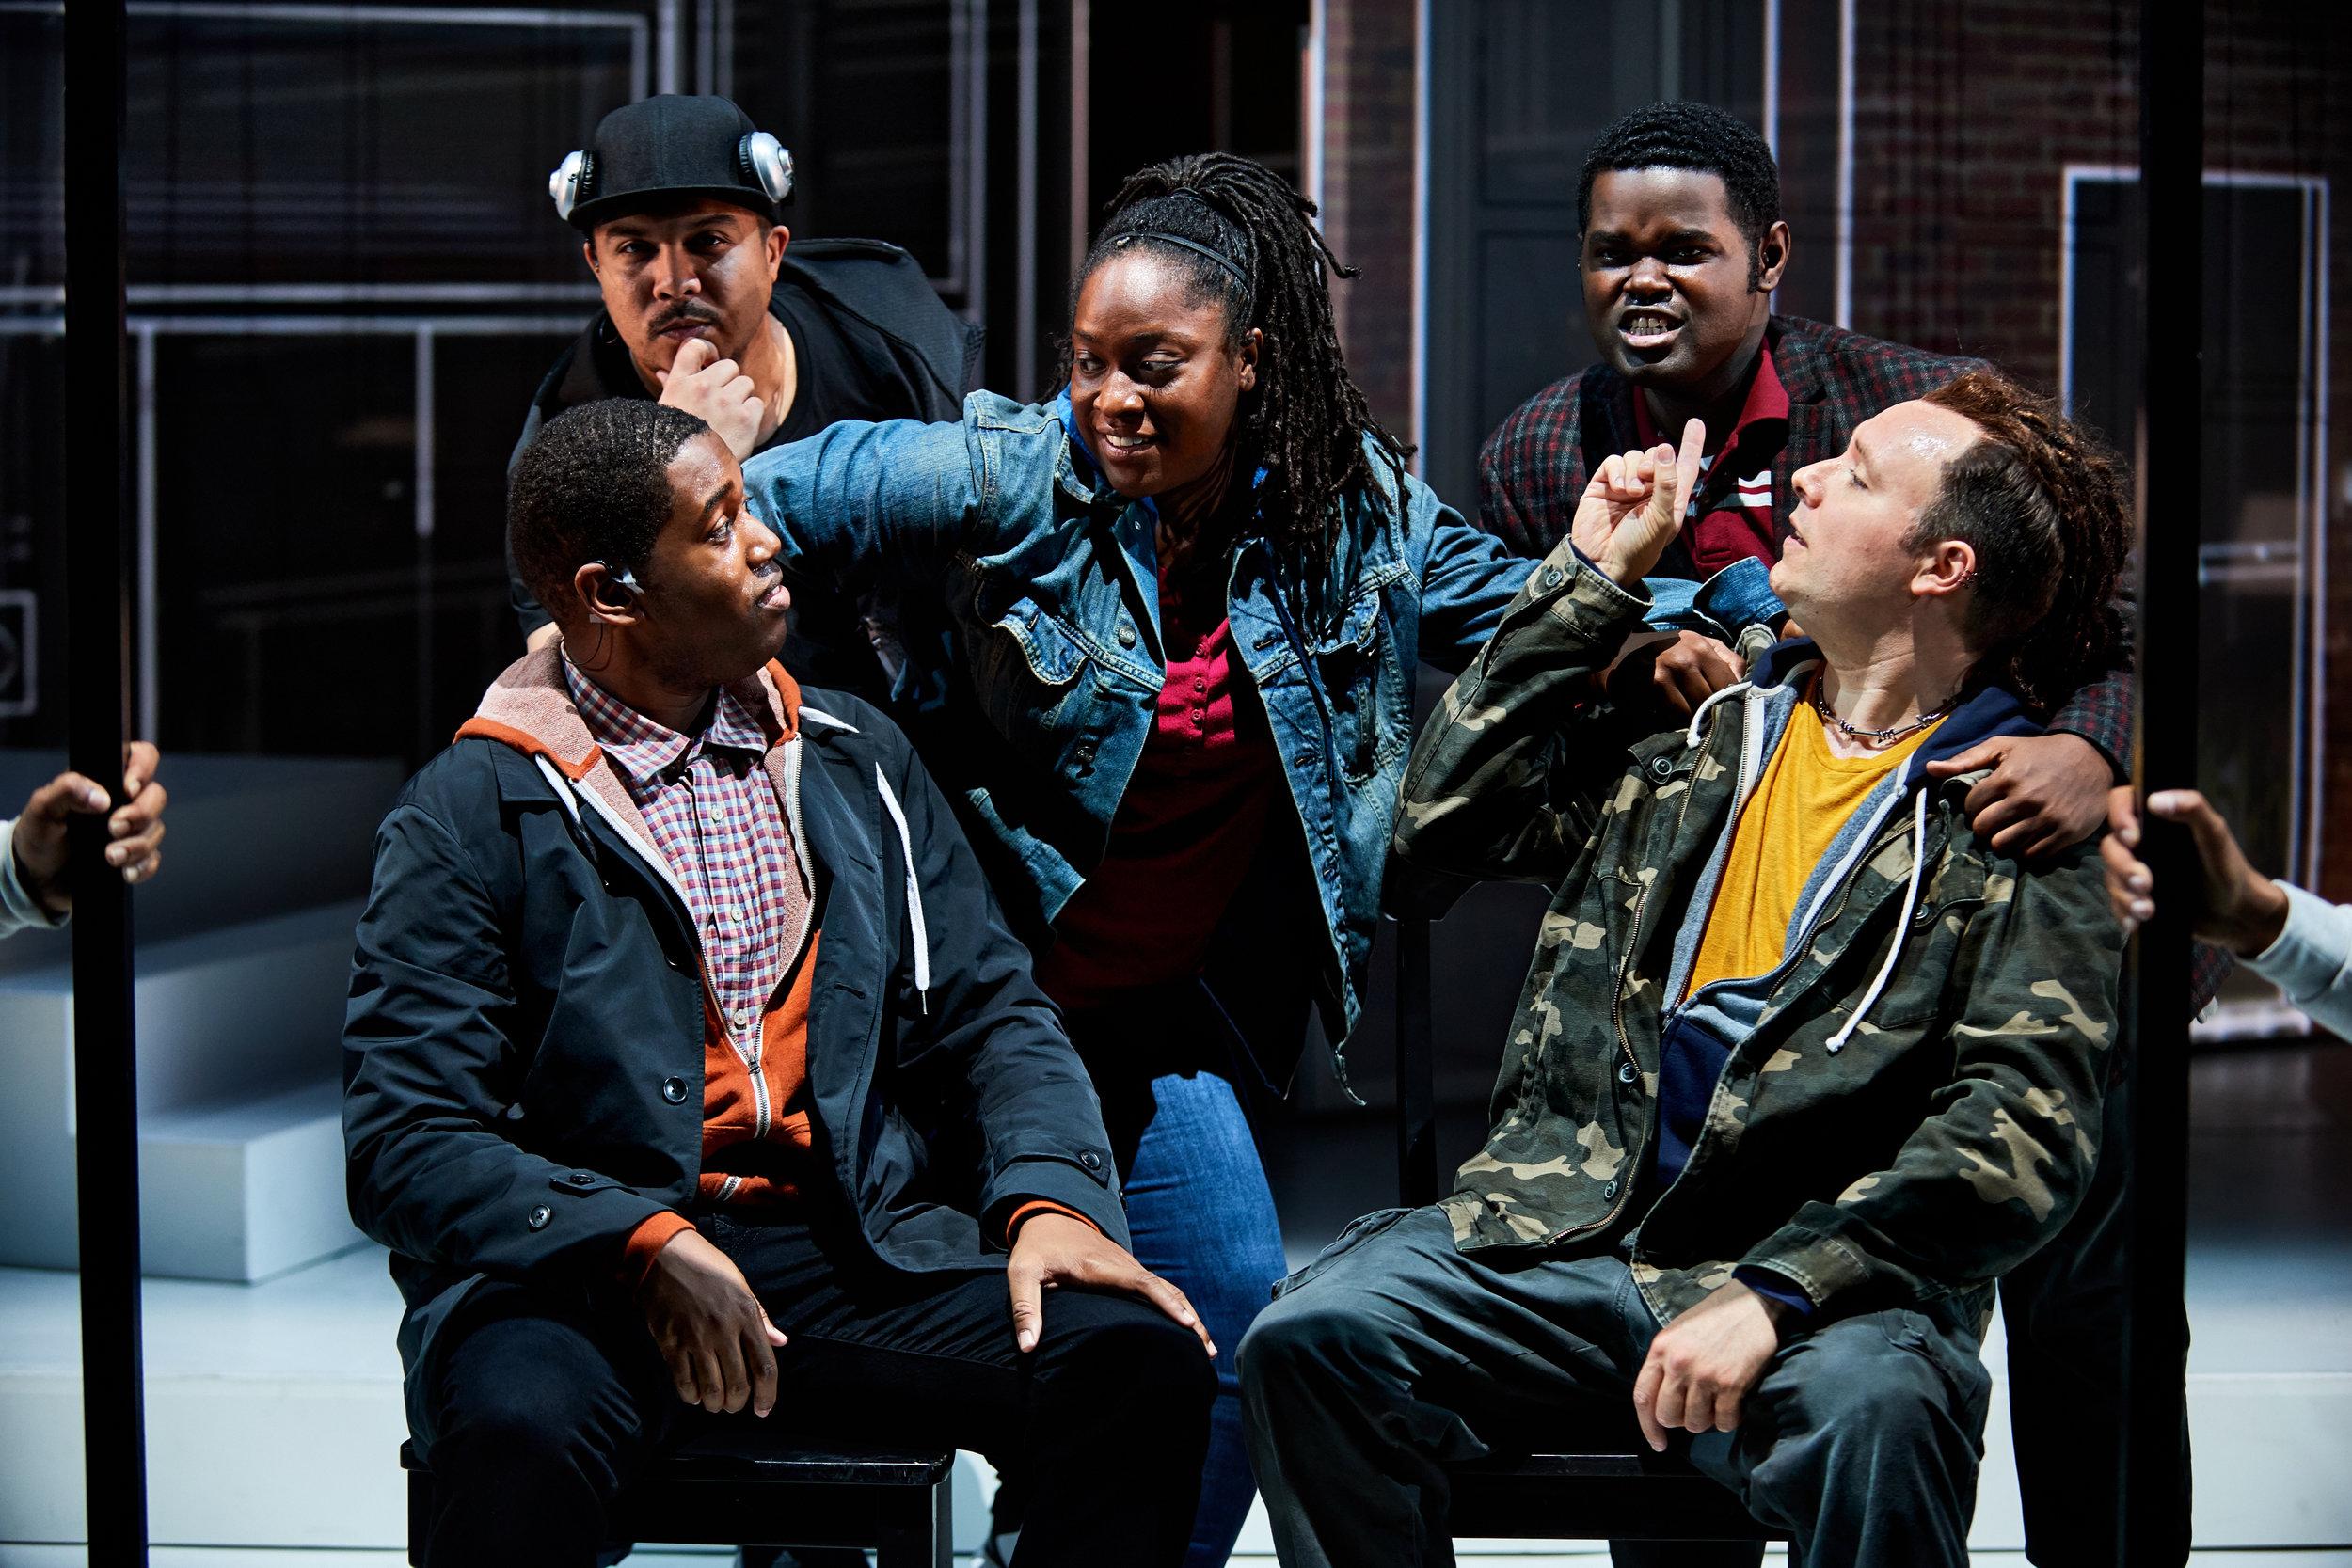 The cast from top left: John Henry (Aubrey Allicock), Un/Sung (Lauren Whitehead), John Blue (John Holiday), John Little (Daniel Shirley) and John Mack (Adam Richardson)